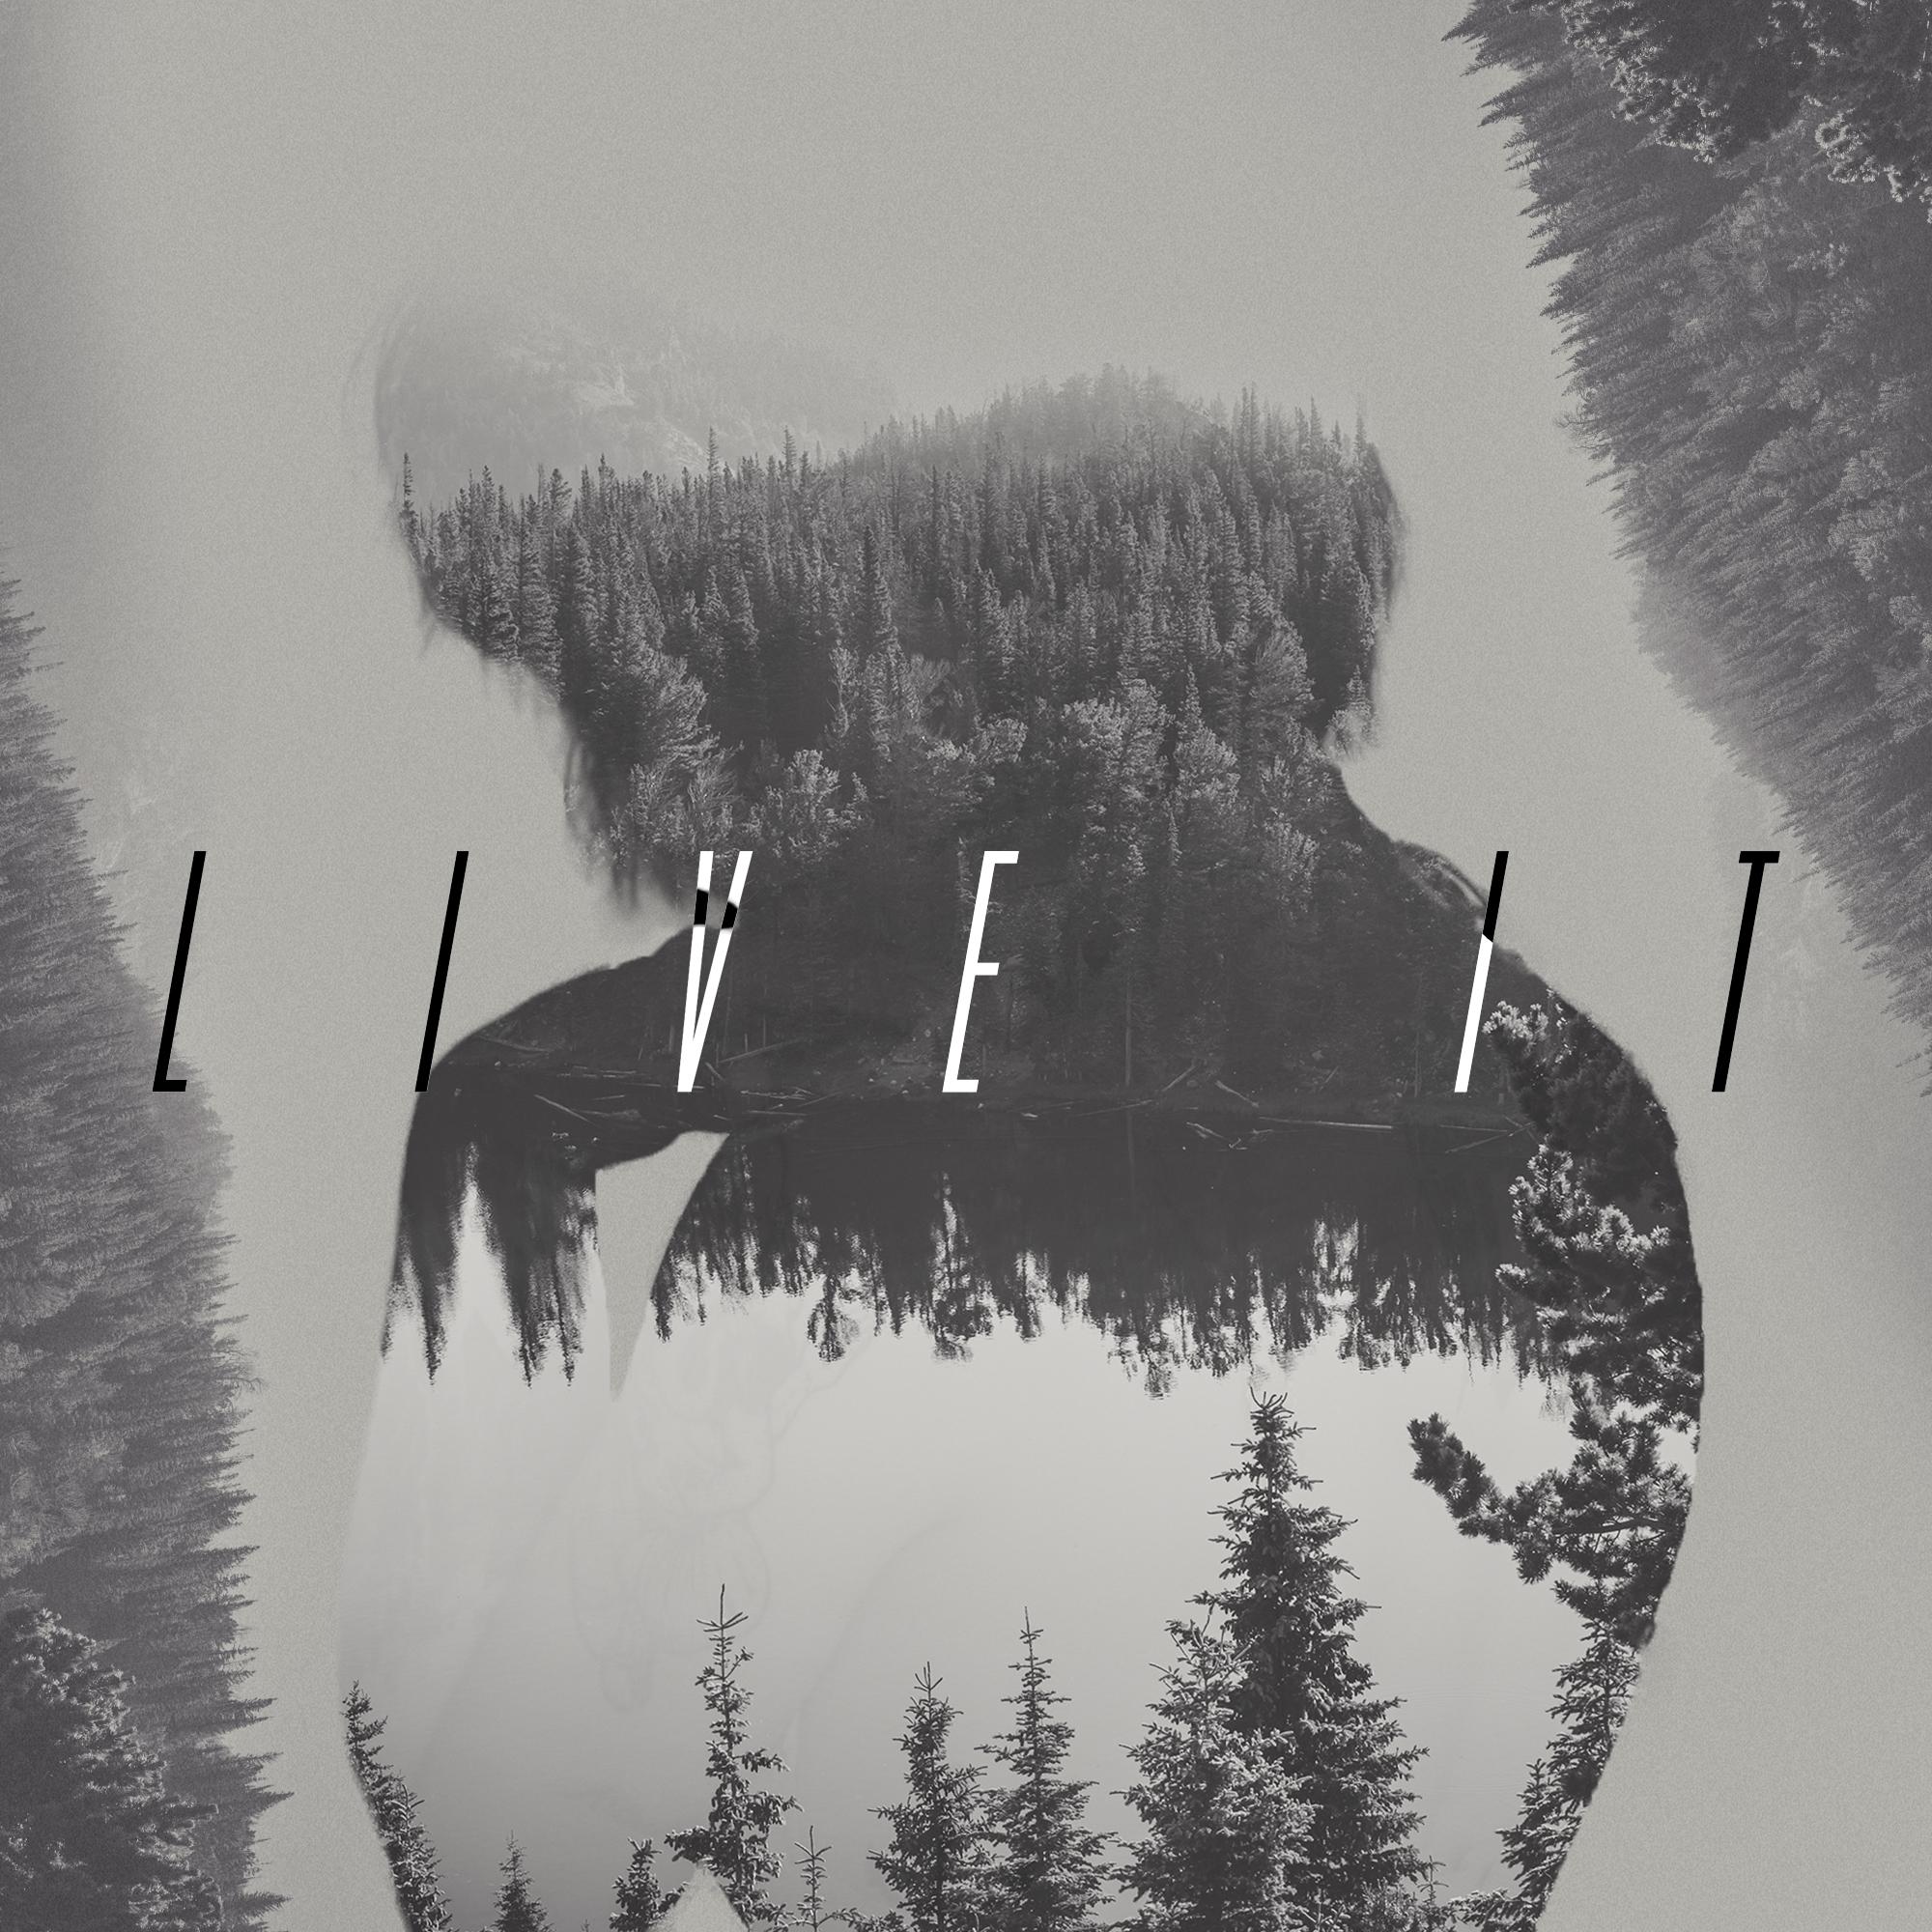 LIVE_IT_WEB.jpg